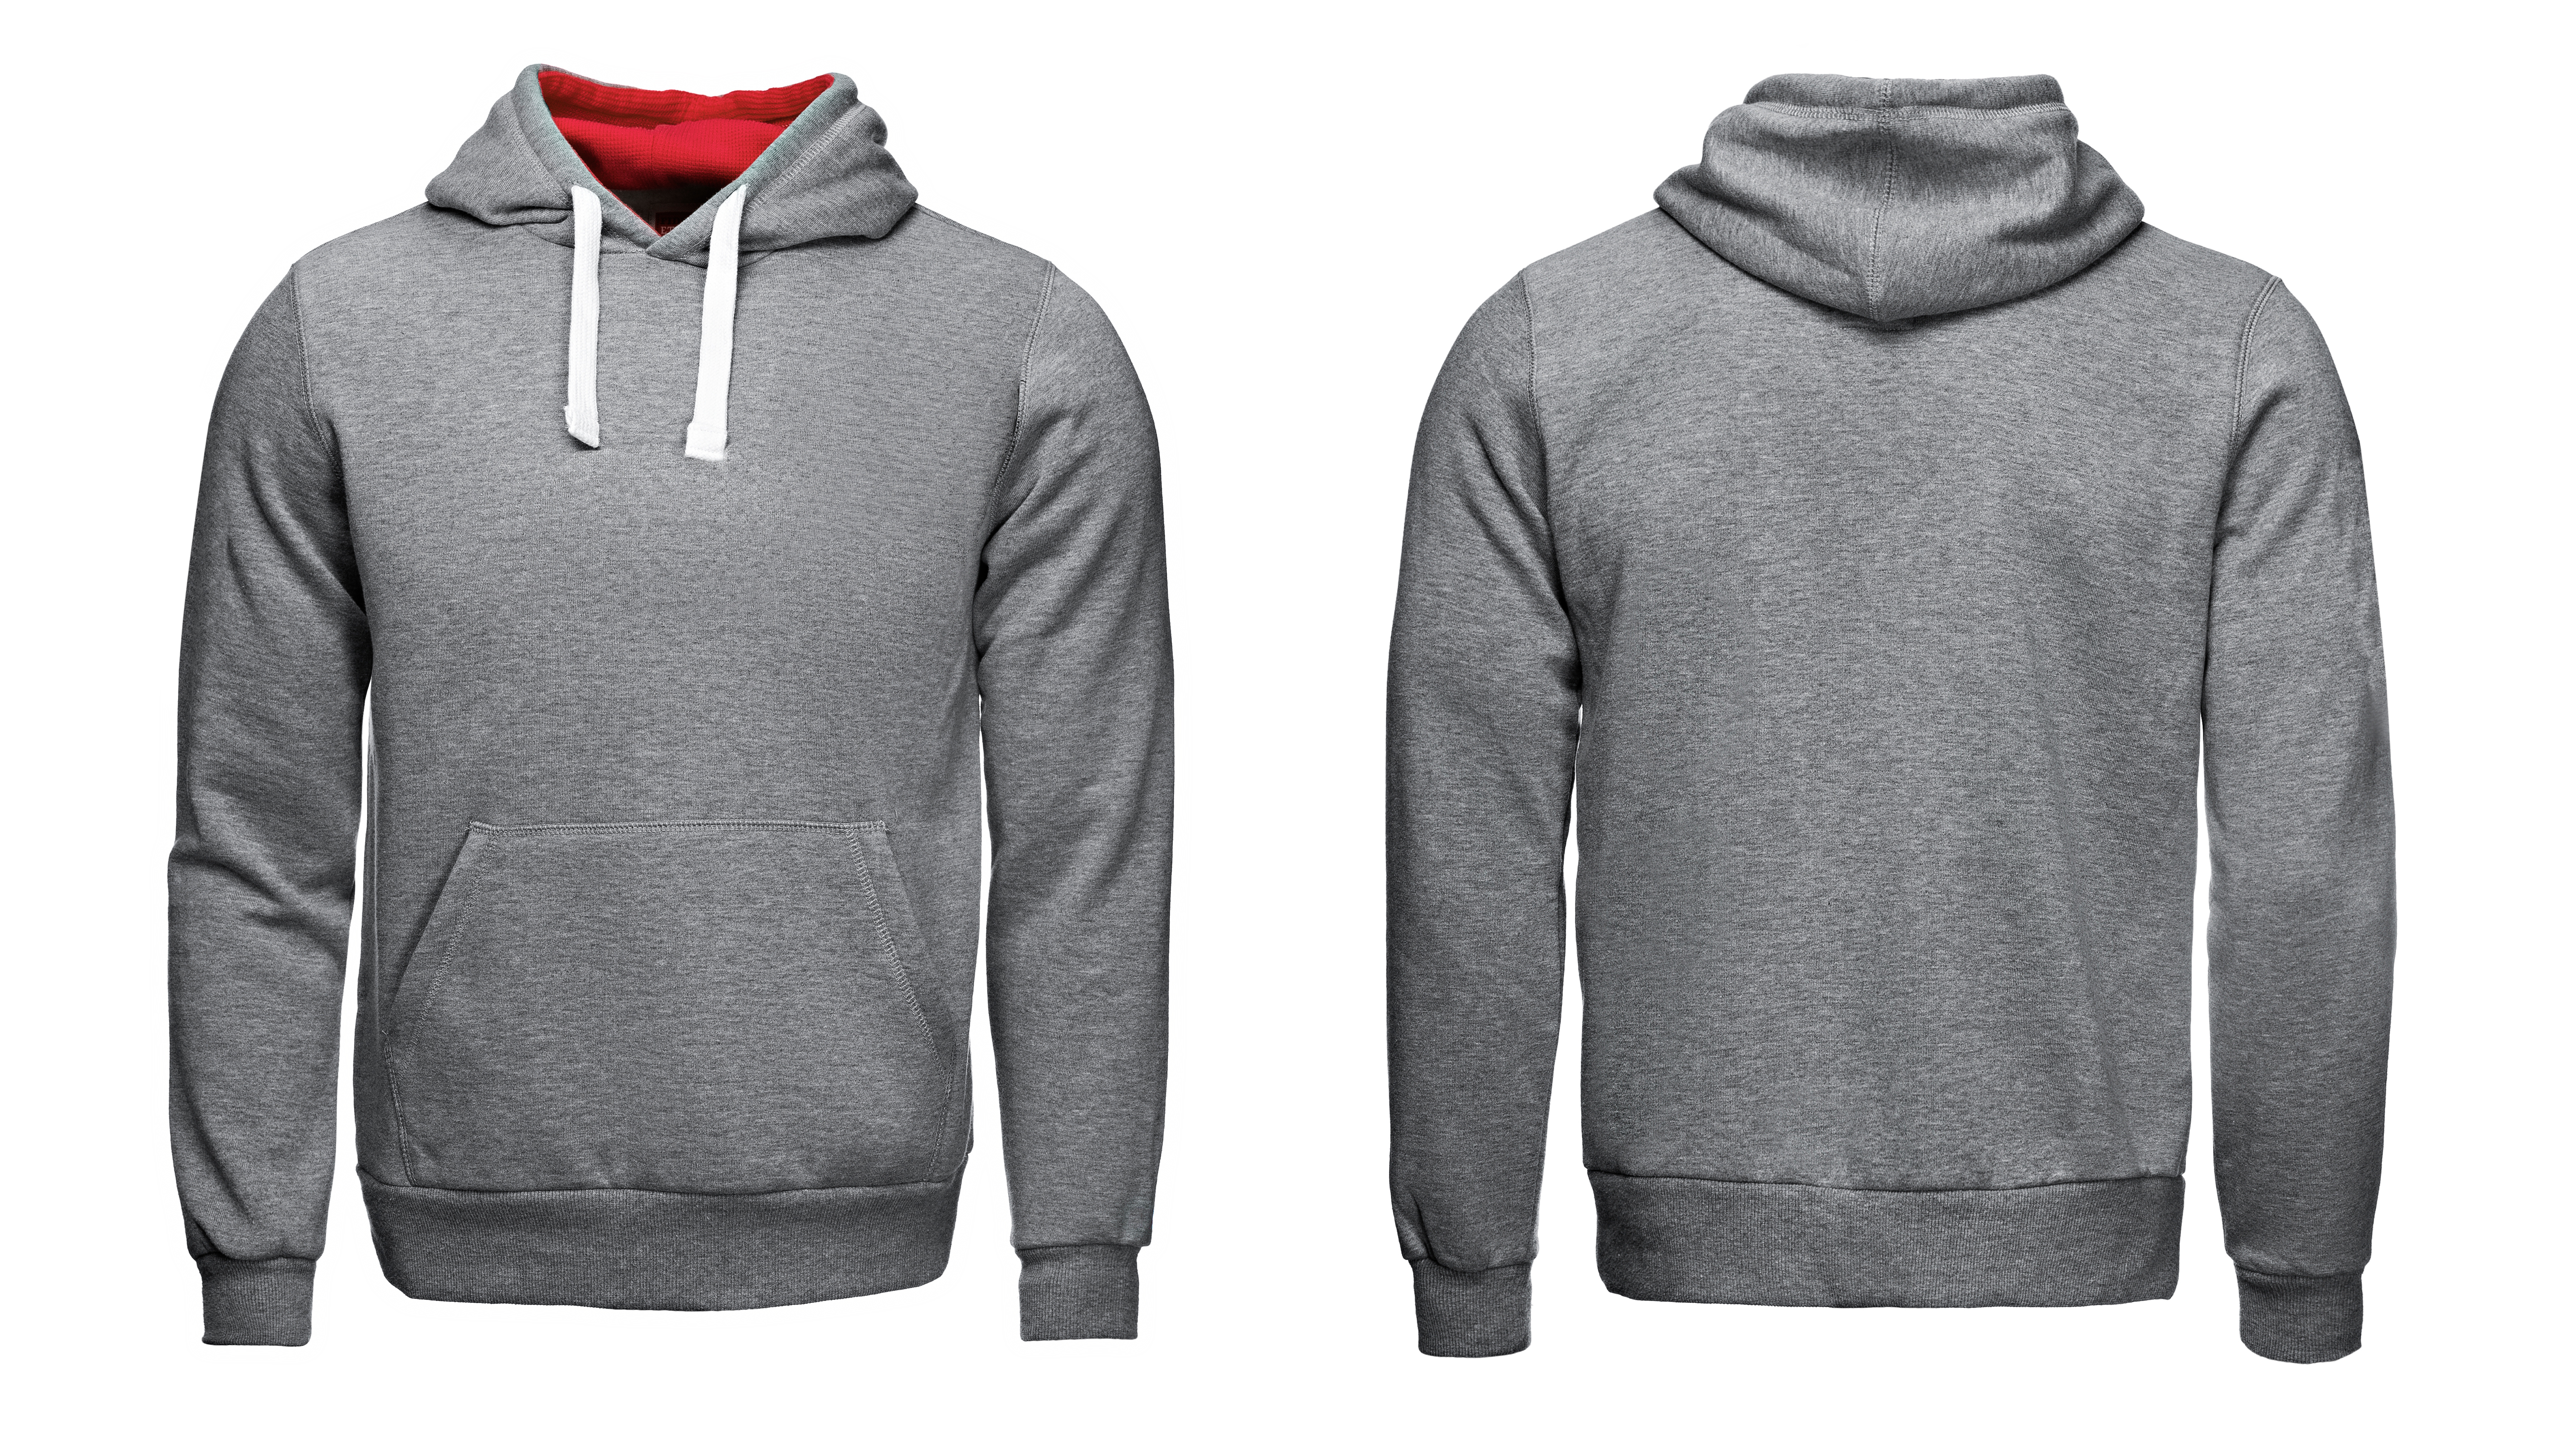 Custom made sweatshirts with hood (7)